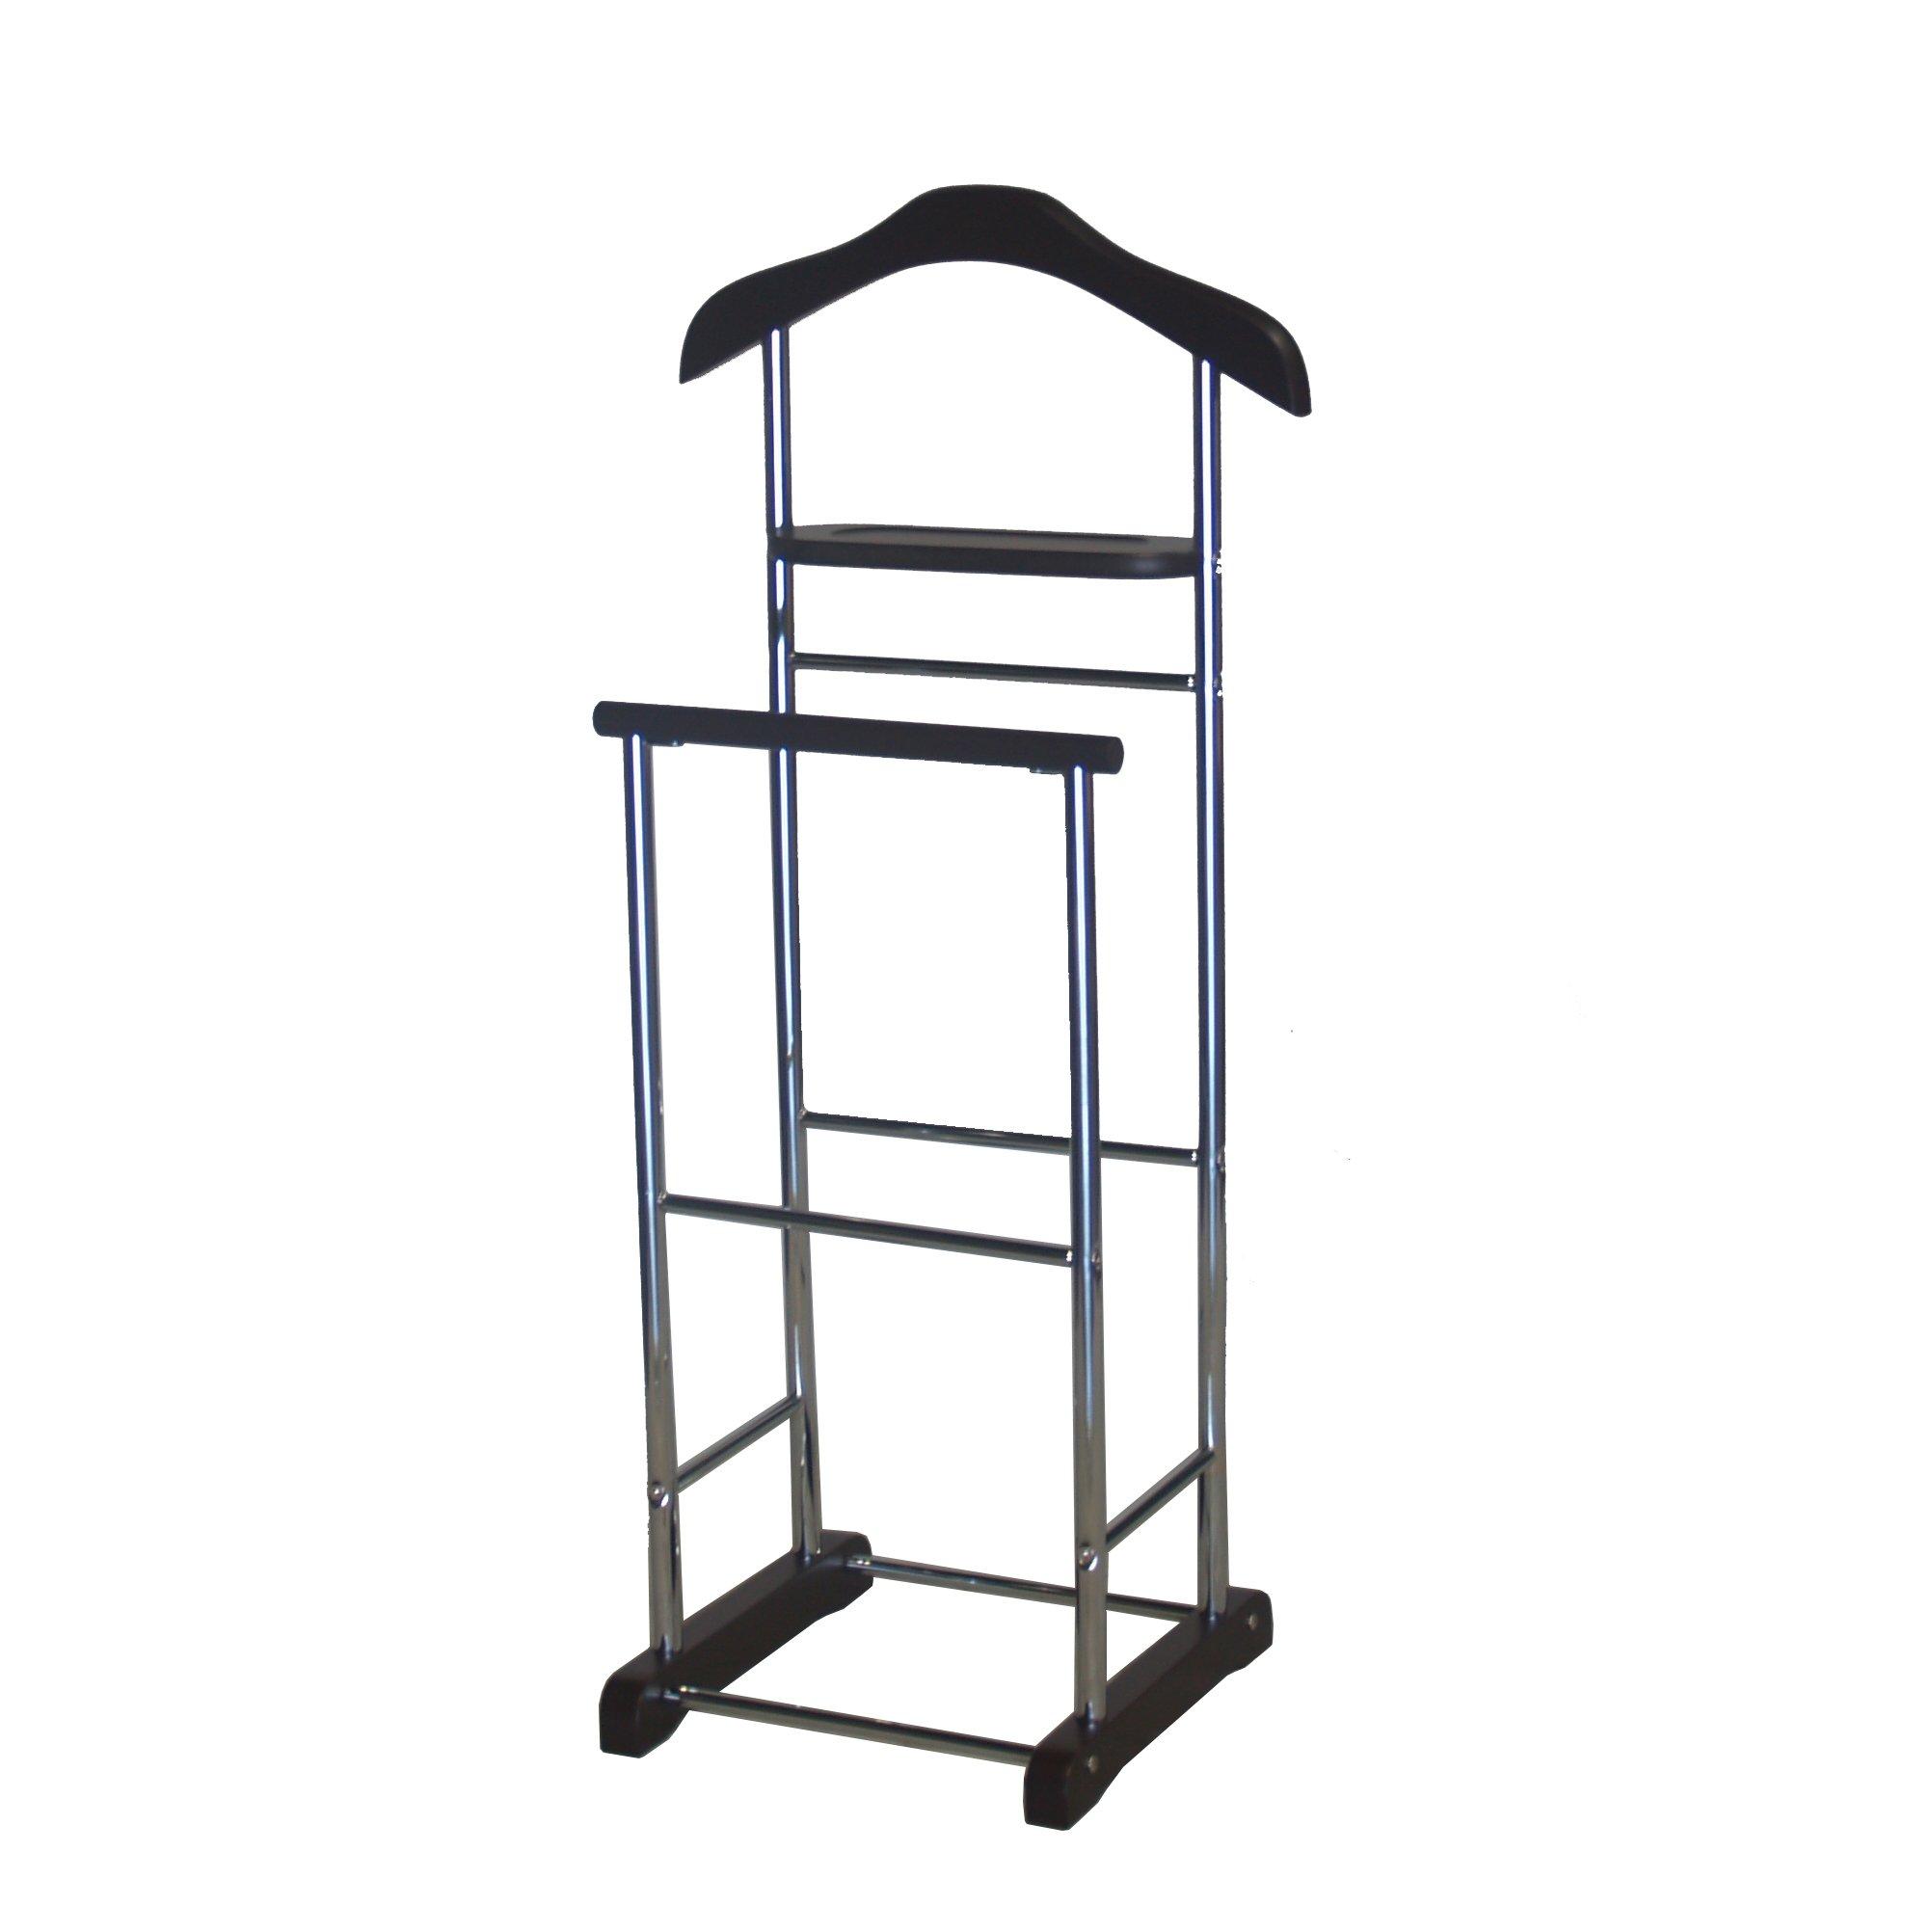 Proman Products VL17026 Fuji Twin Valet Stand